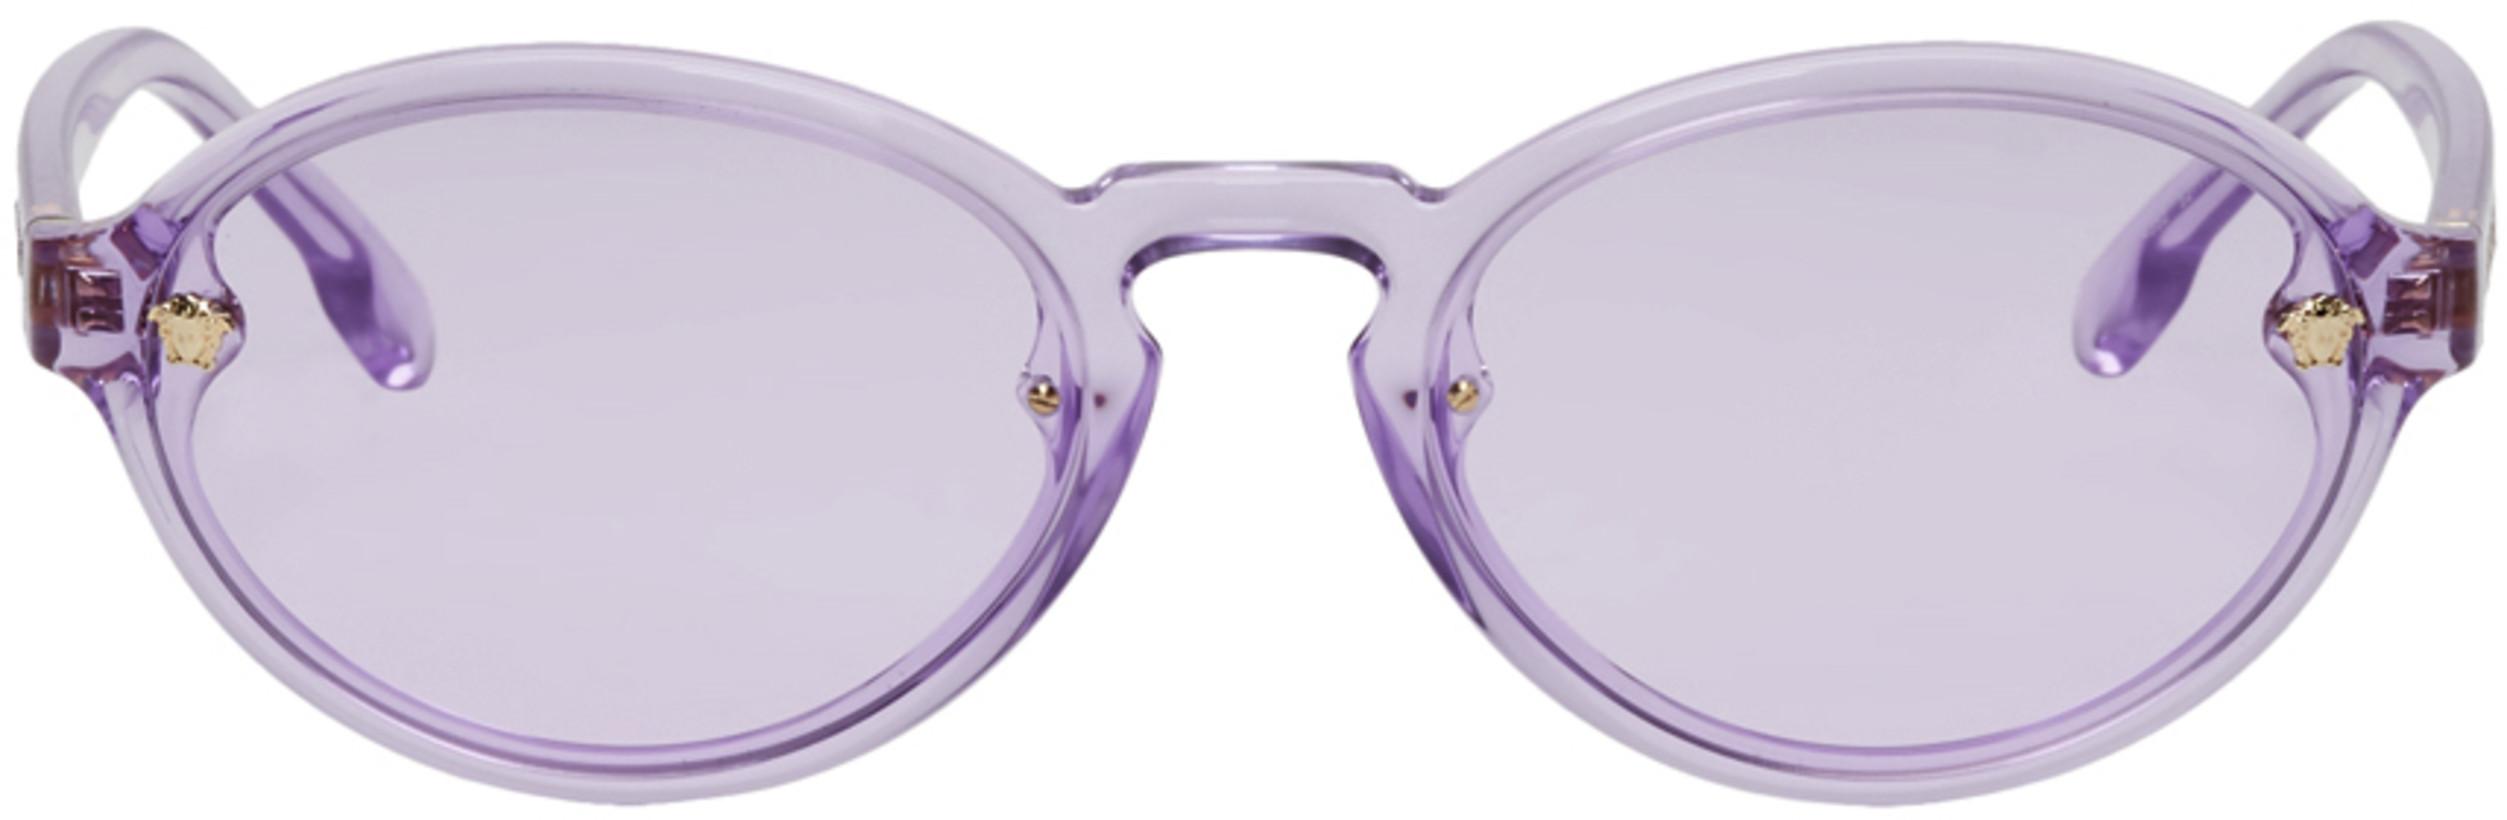 Versace Purple Oval Sunglasses